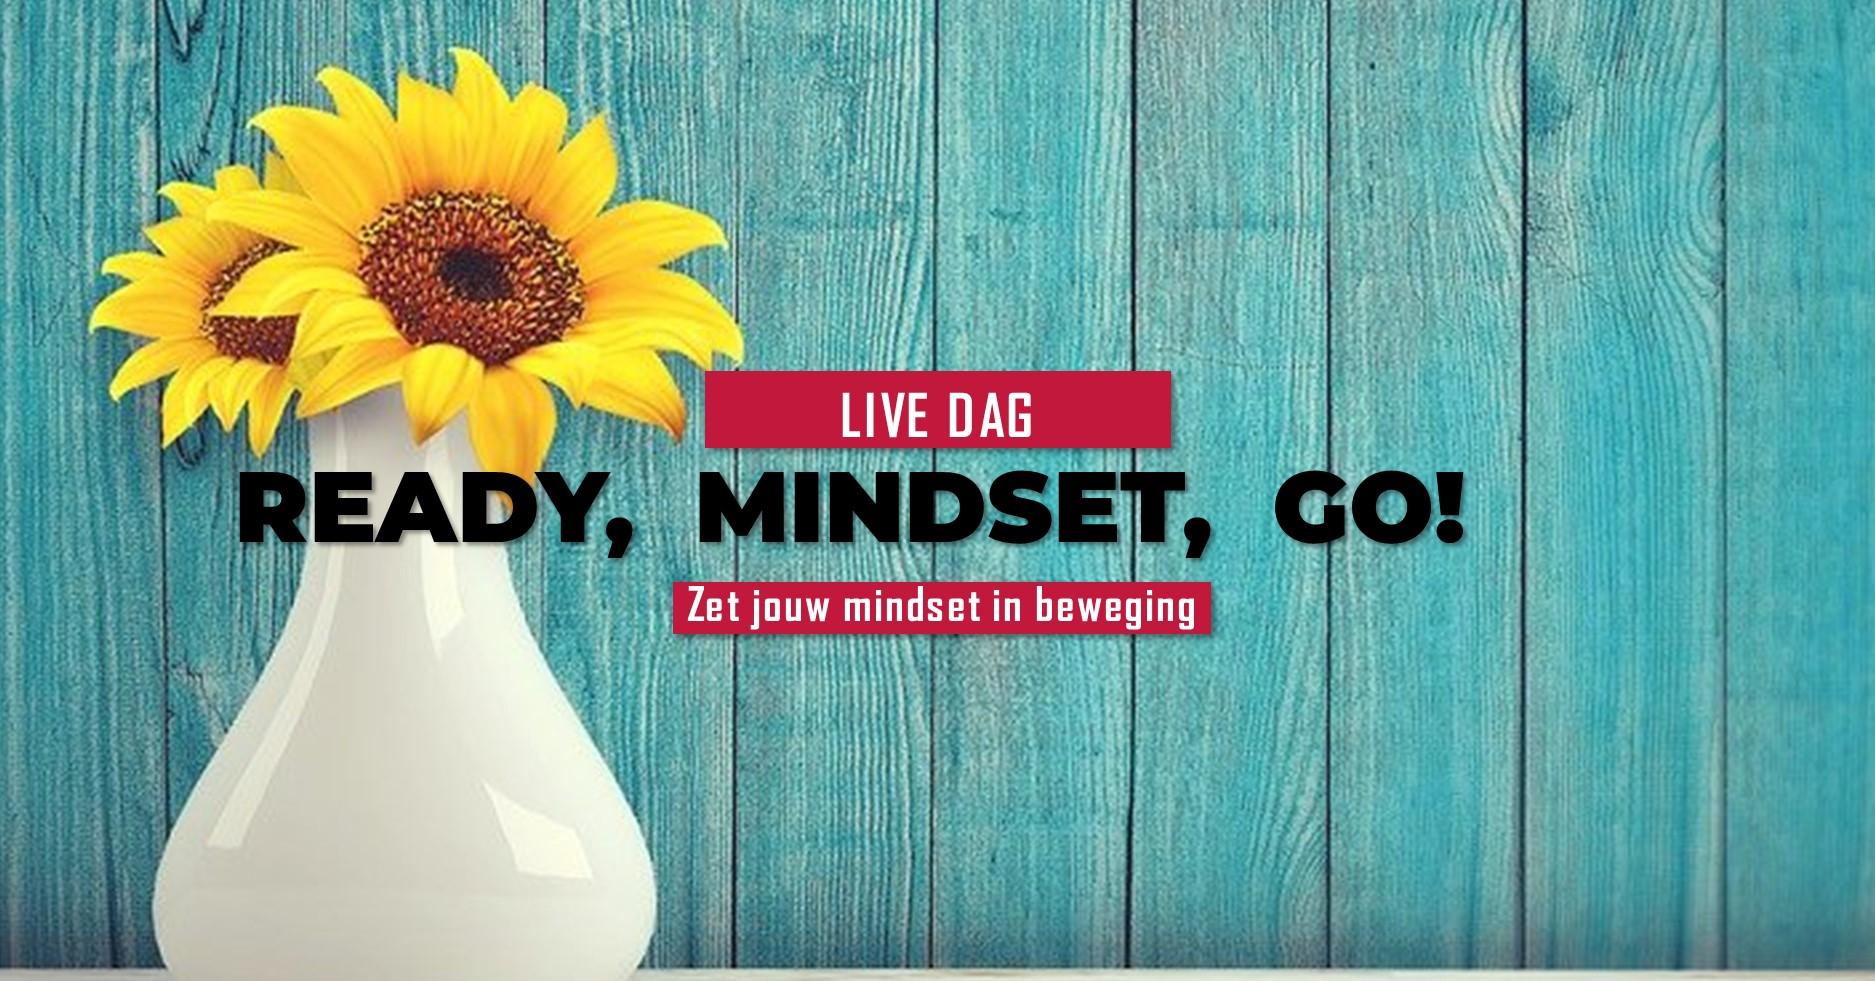 Live Dag Ready Mindset Go